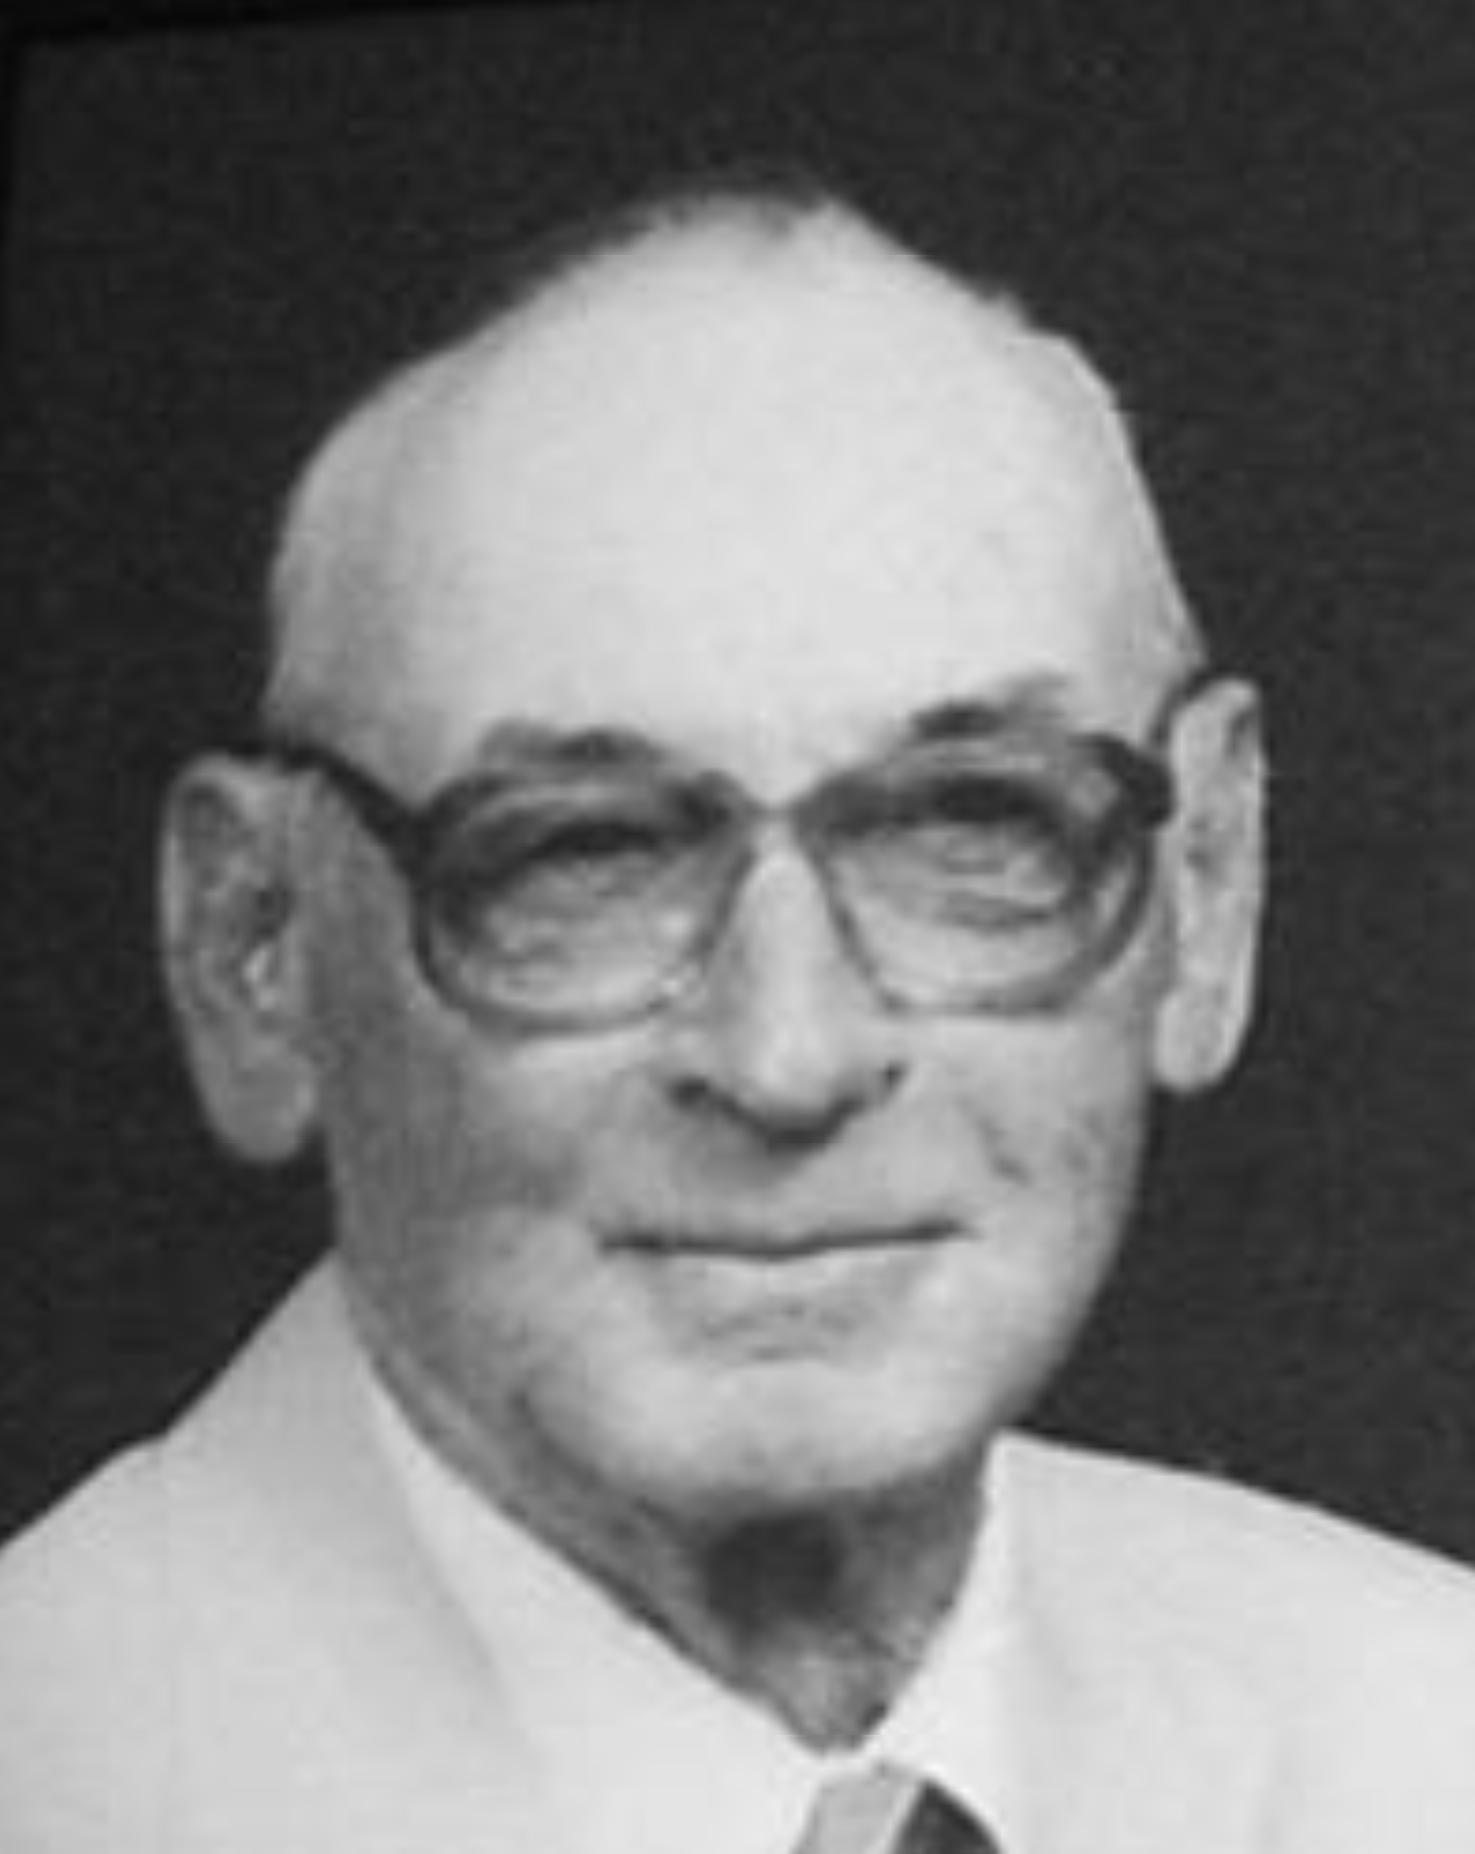 MELVIN C. WILSON